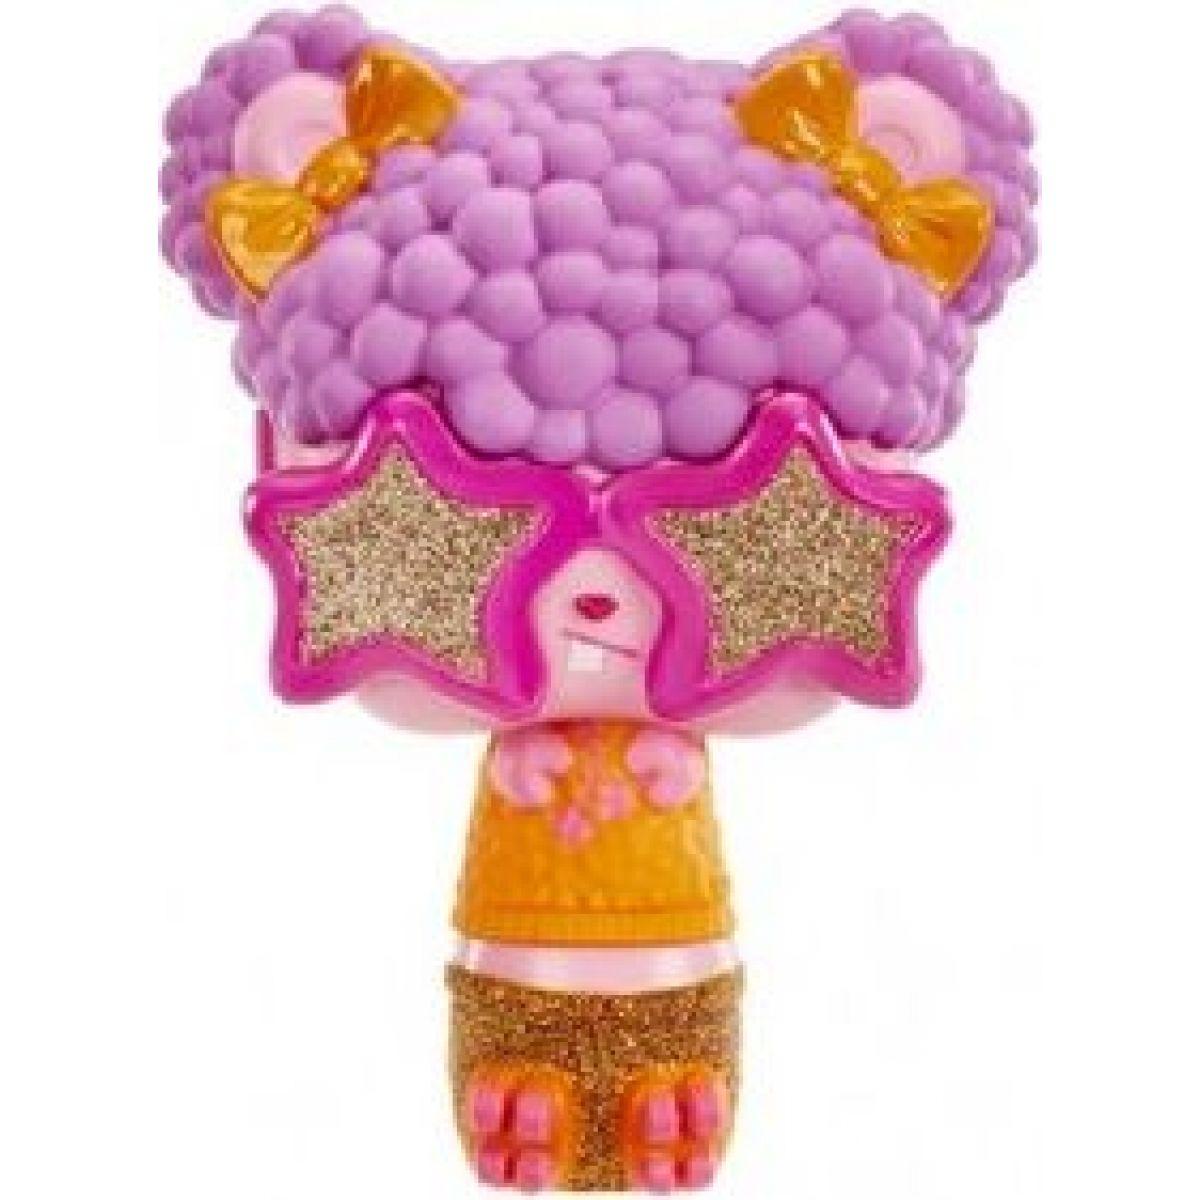 Pop Pop Hair Surprise 3-in-1 Pops 1. series ružové okuliare, fialové vlasy